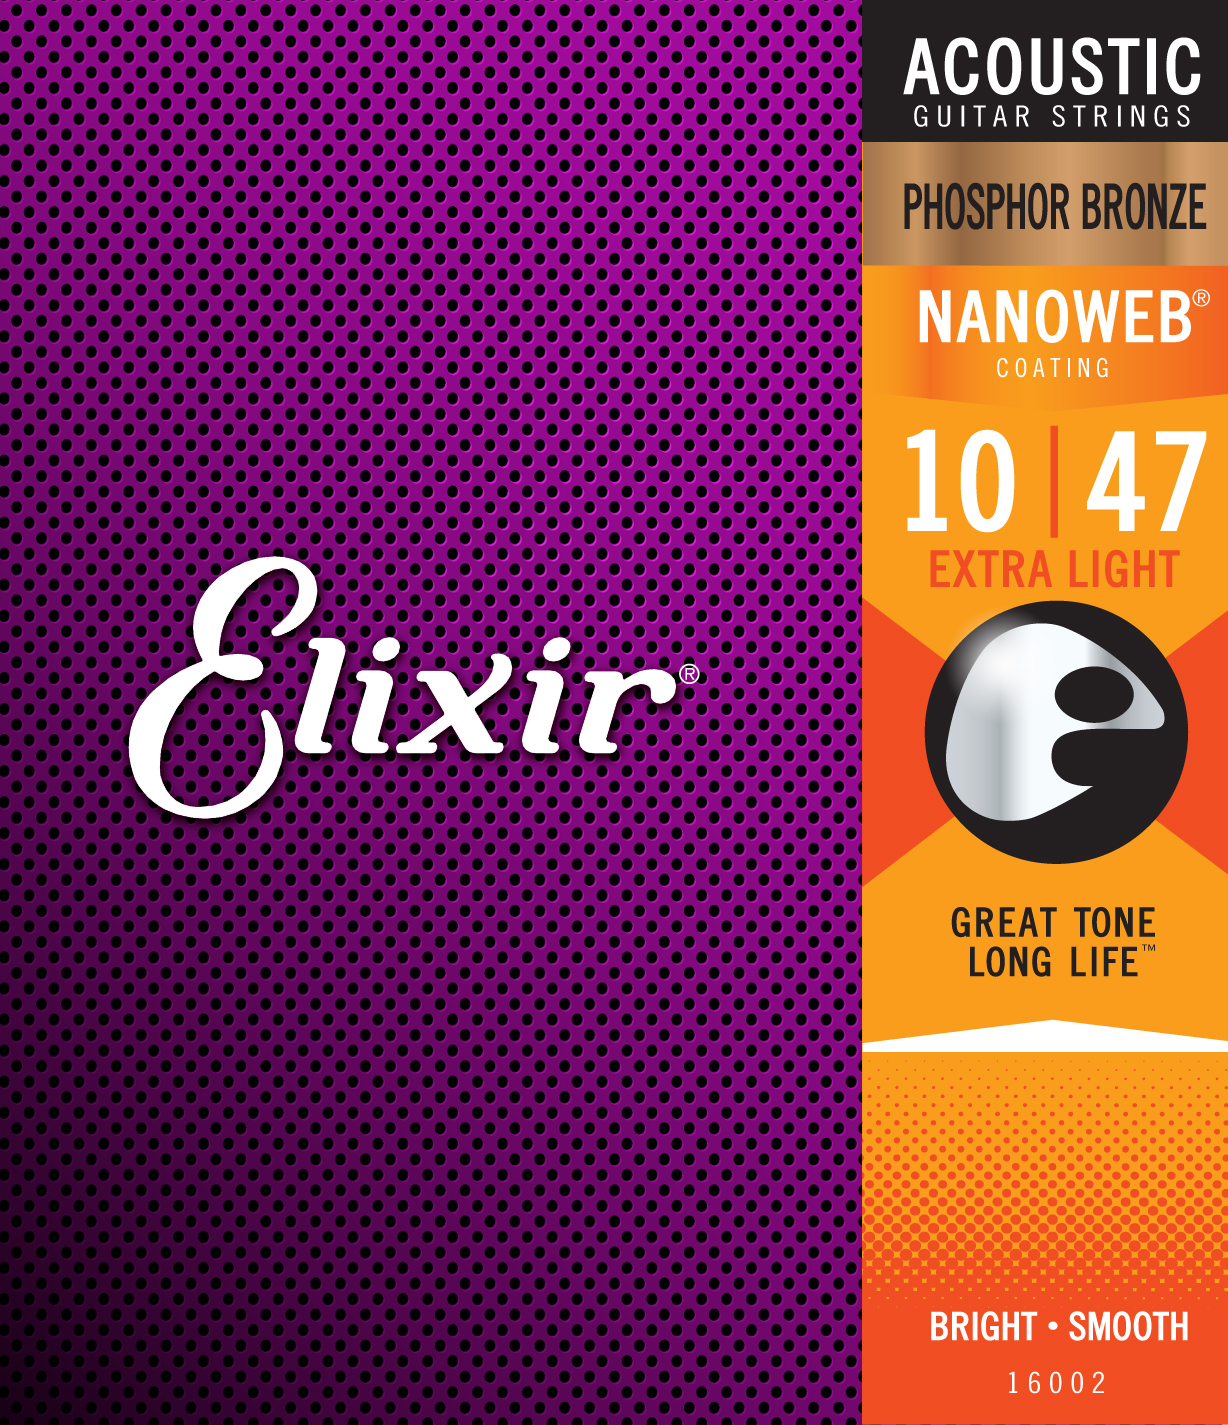 Elixir String Acoustic Phosphor Bronze With Nanoweb Coating, ALL Models